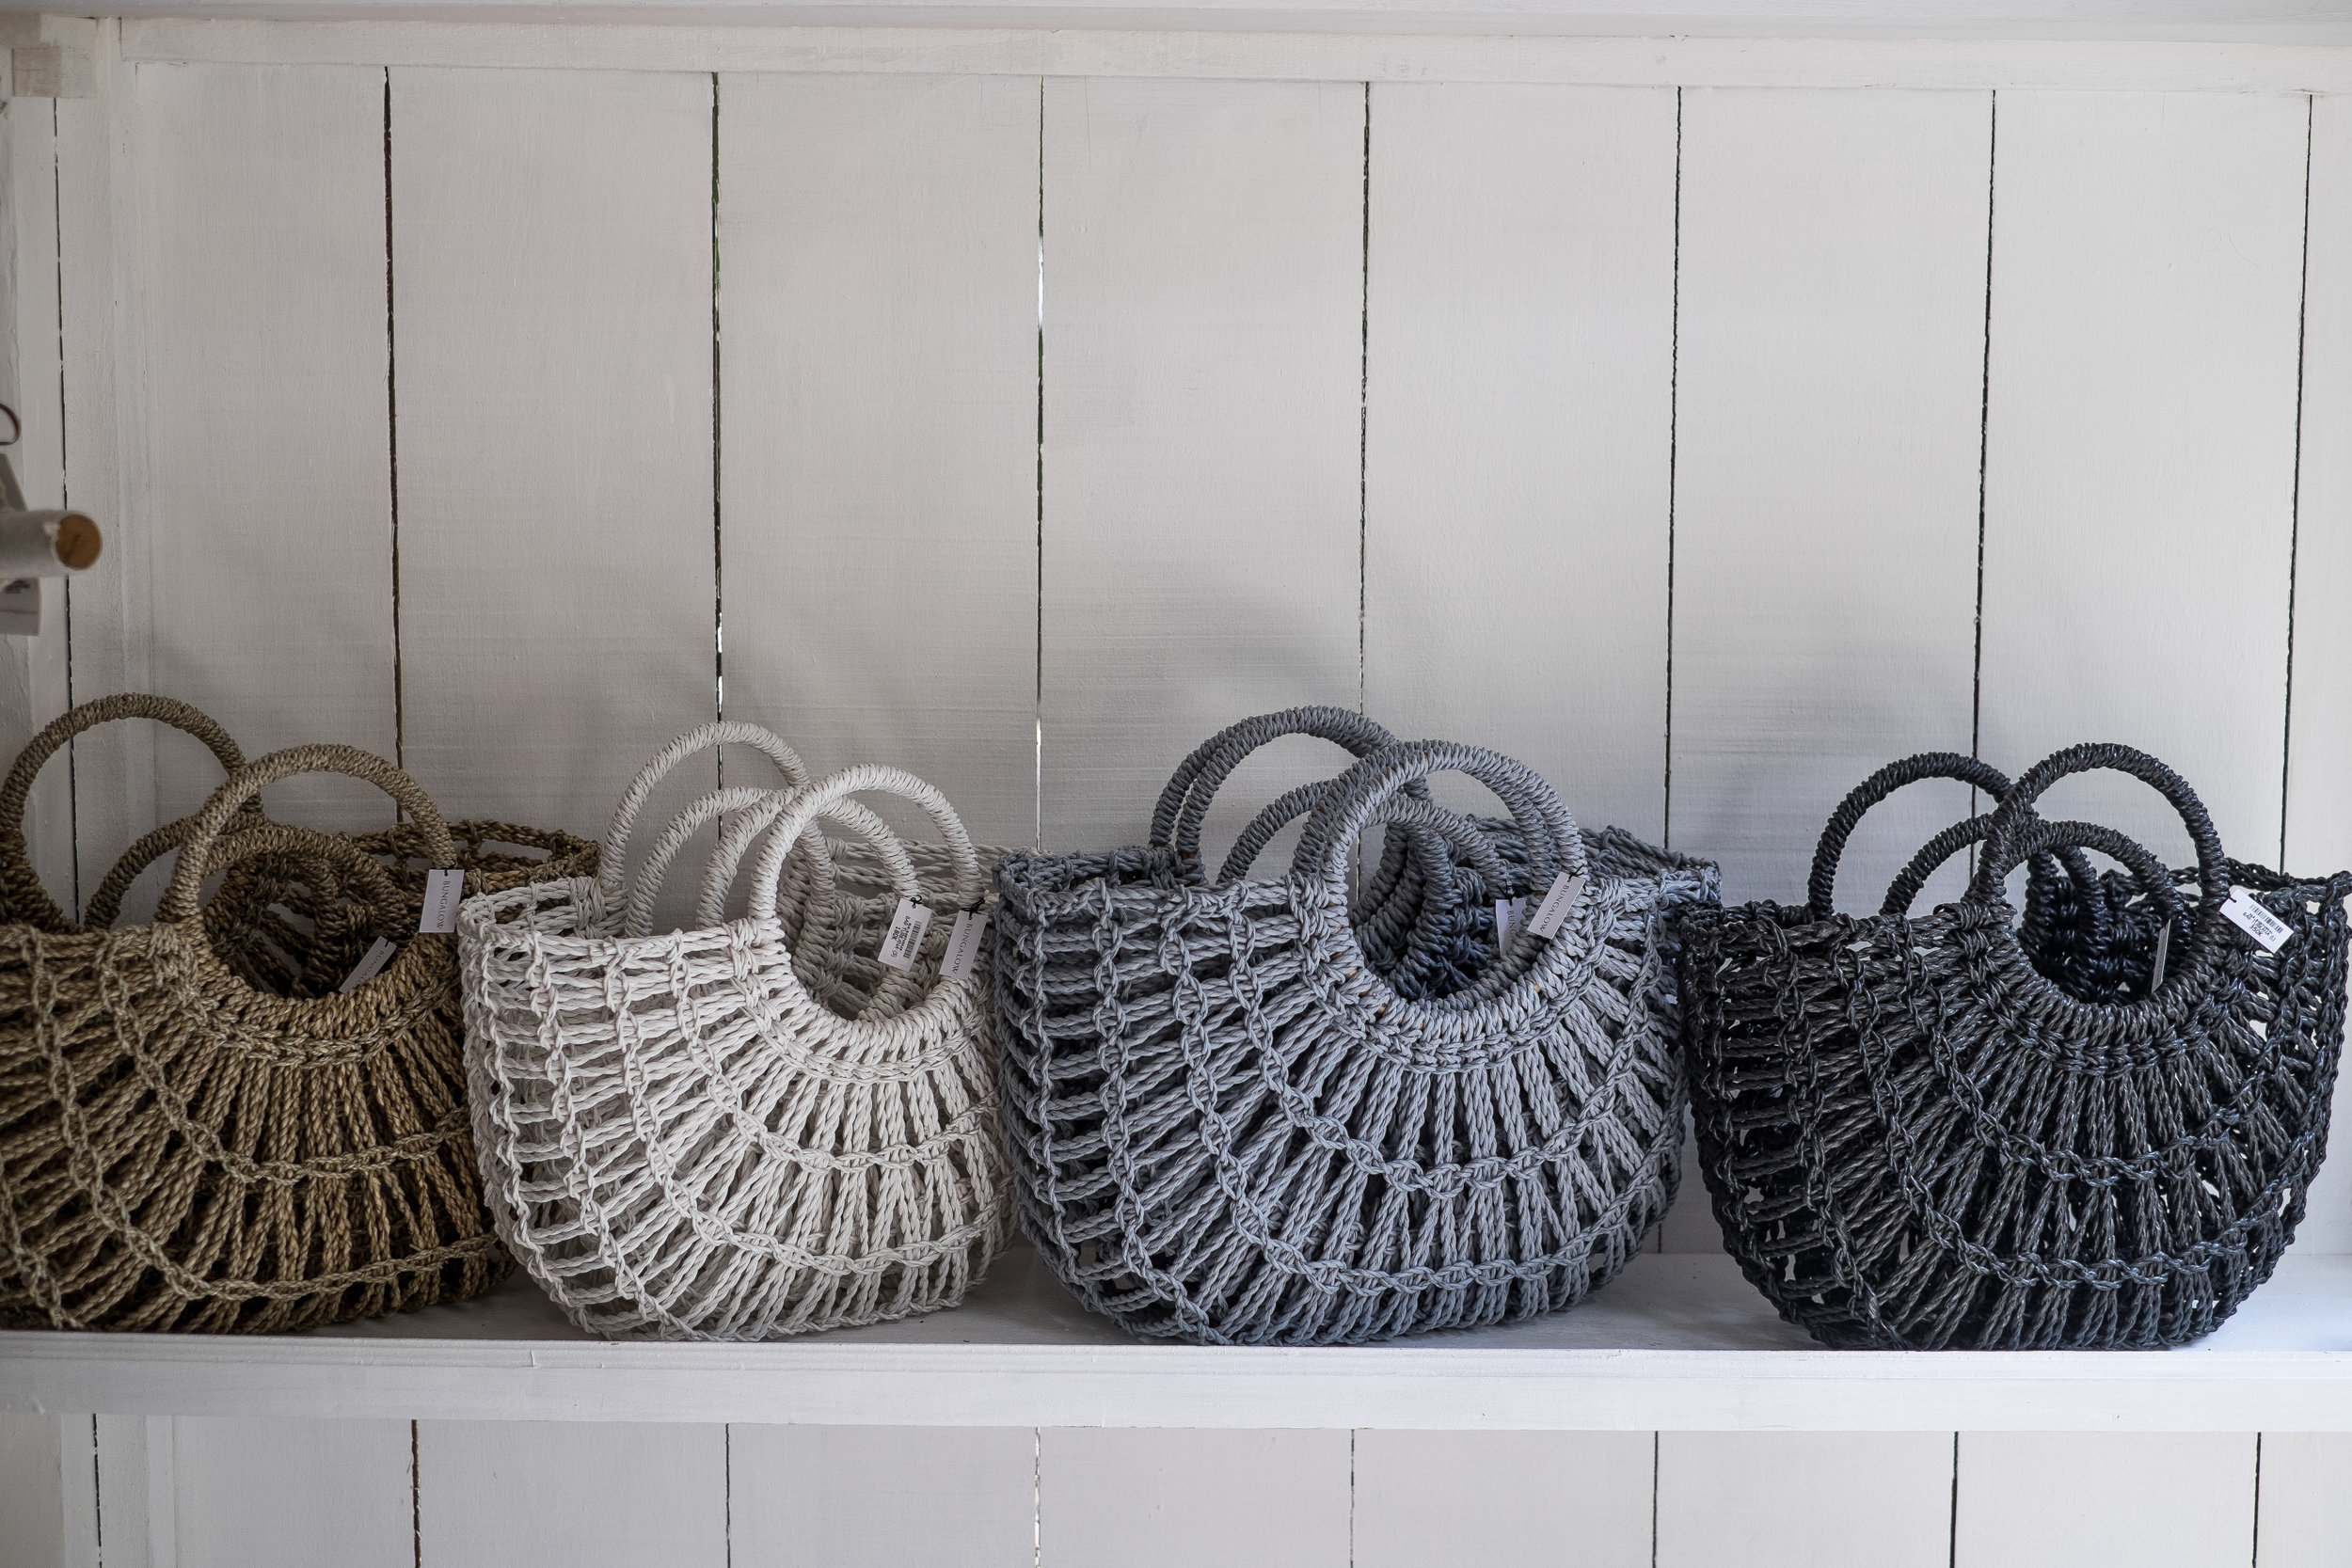 ULTIMATE SHOPPING SAFARI - PACK YOUR BAGS!